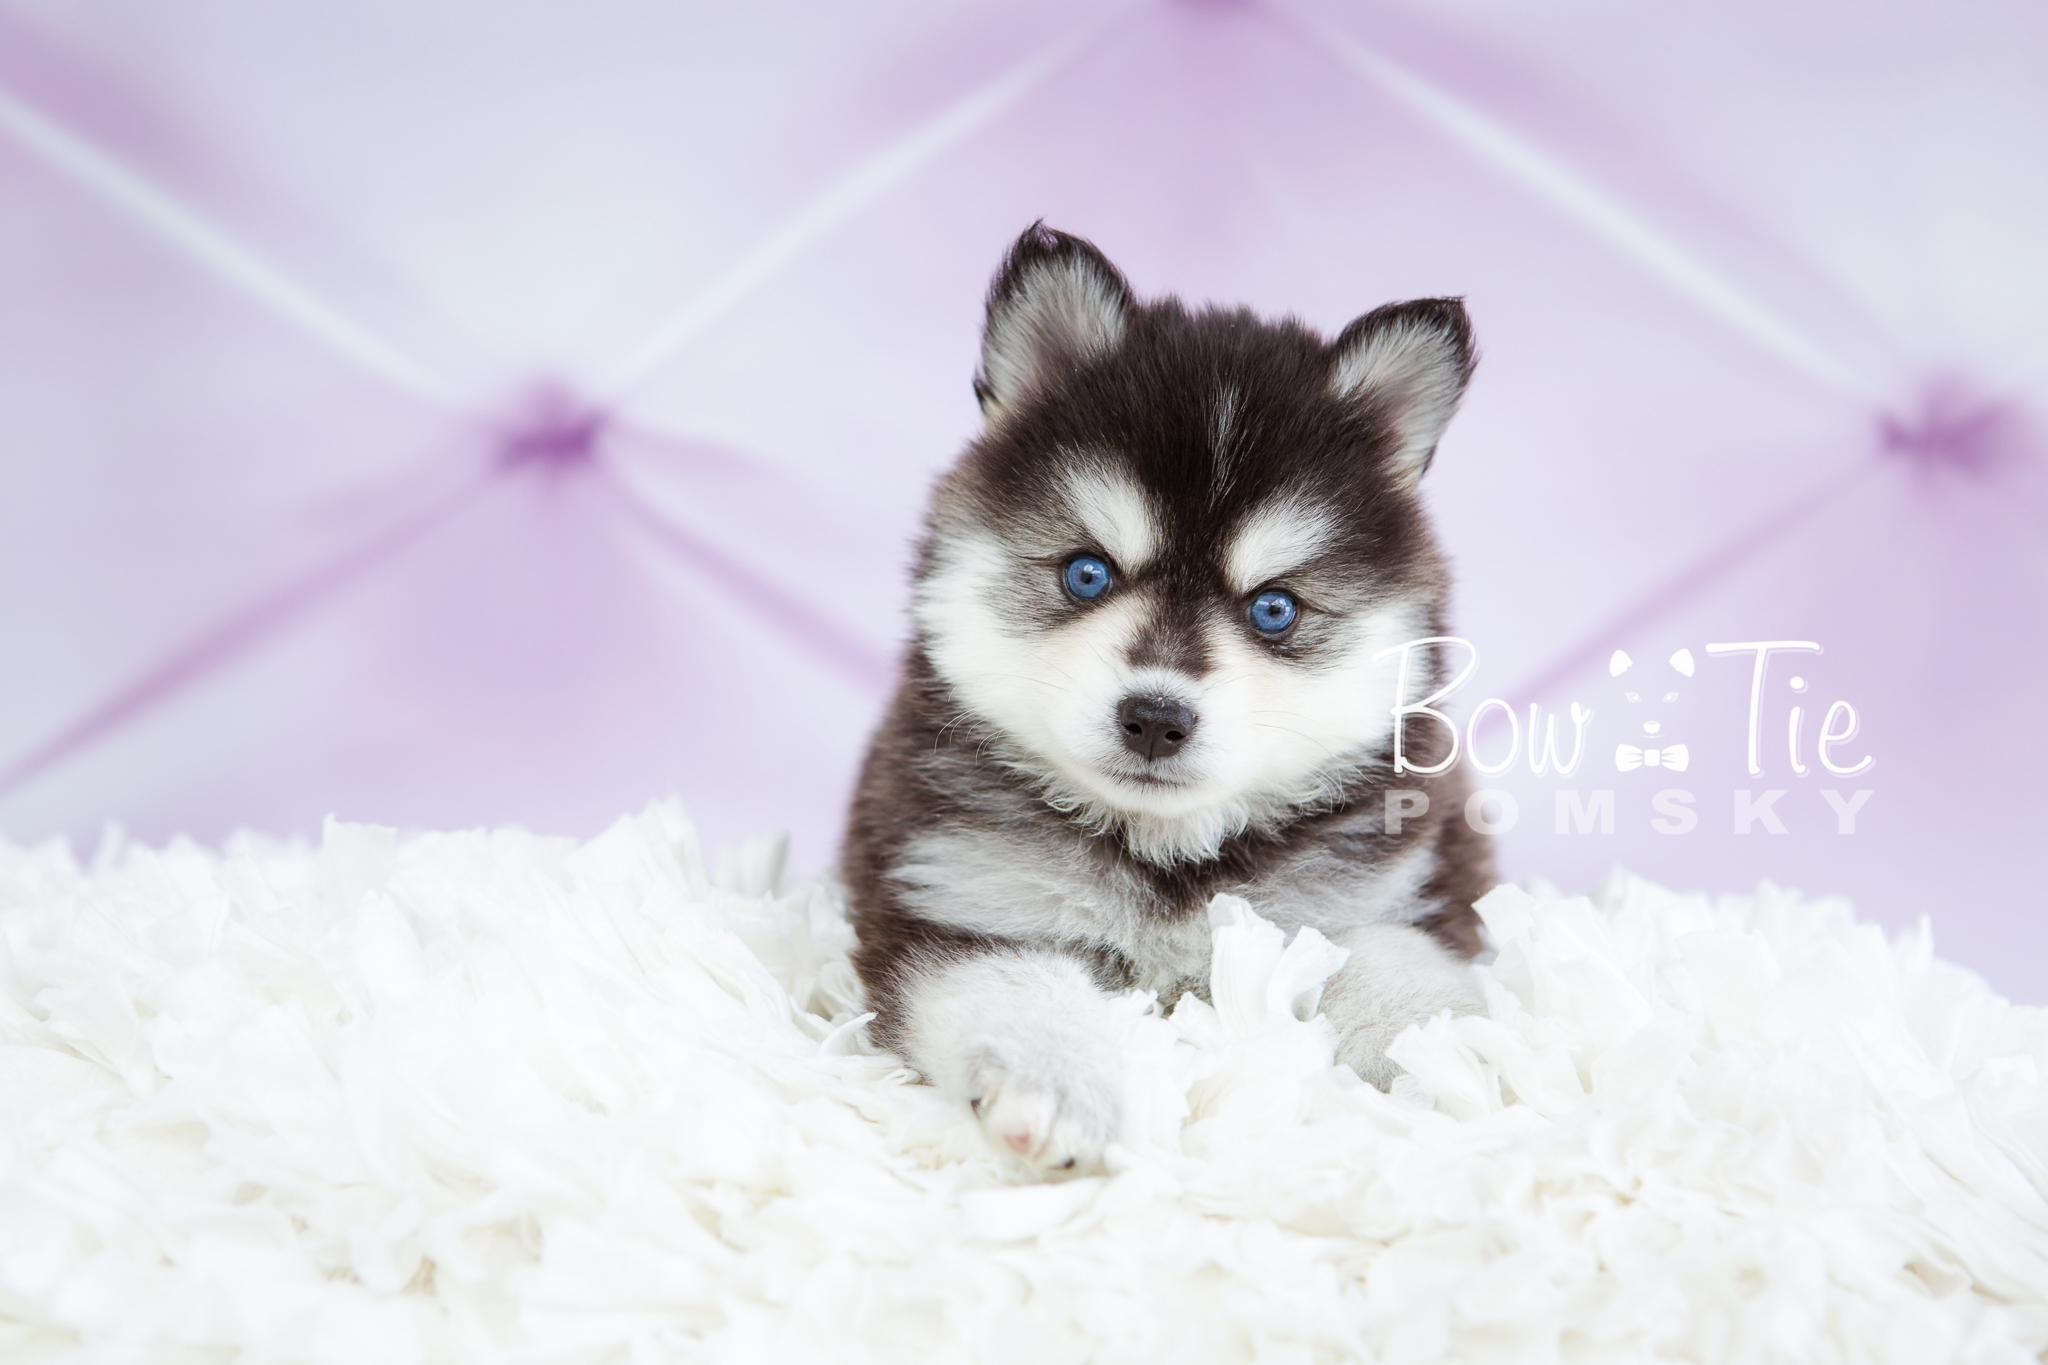 1st Gen Puppy 21 - Girl - Bowtie Pomsky LLC